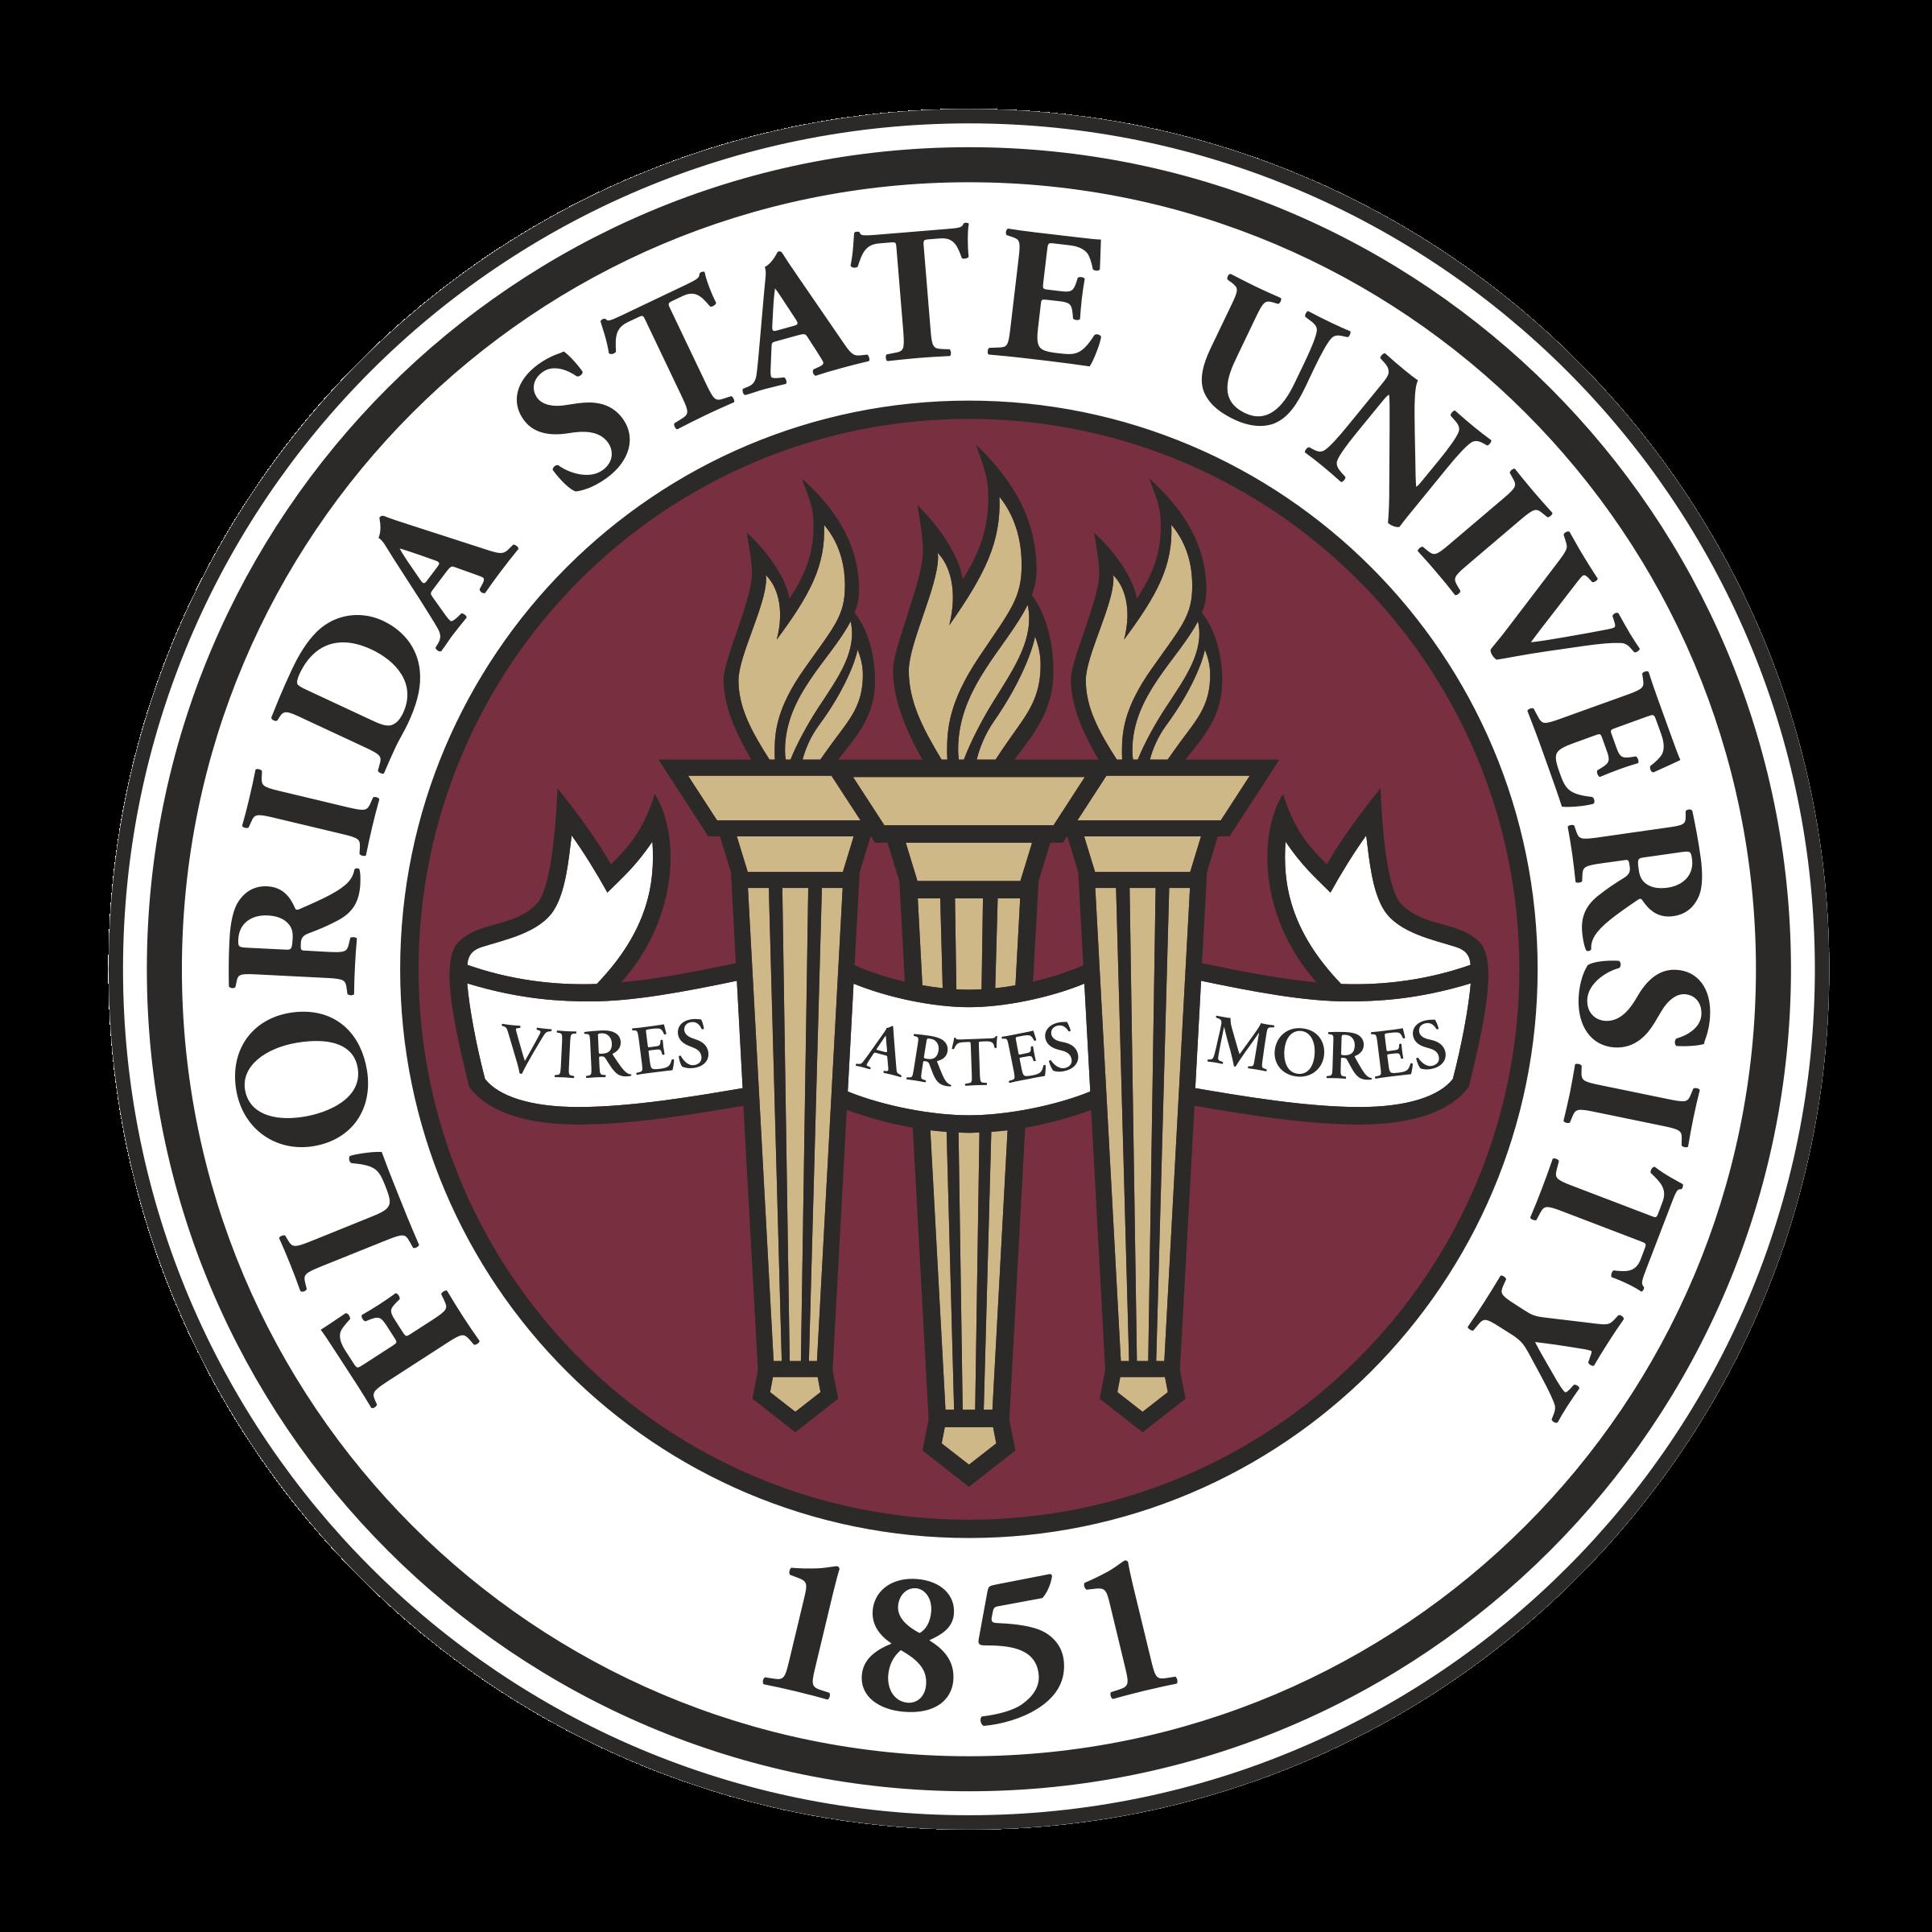 florida-state-university-logo-png-transparent